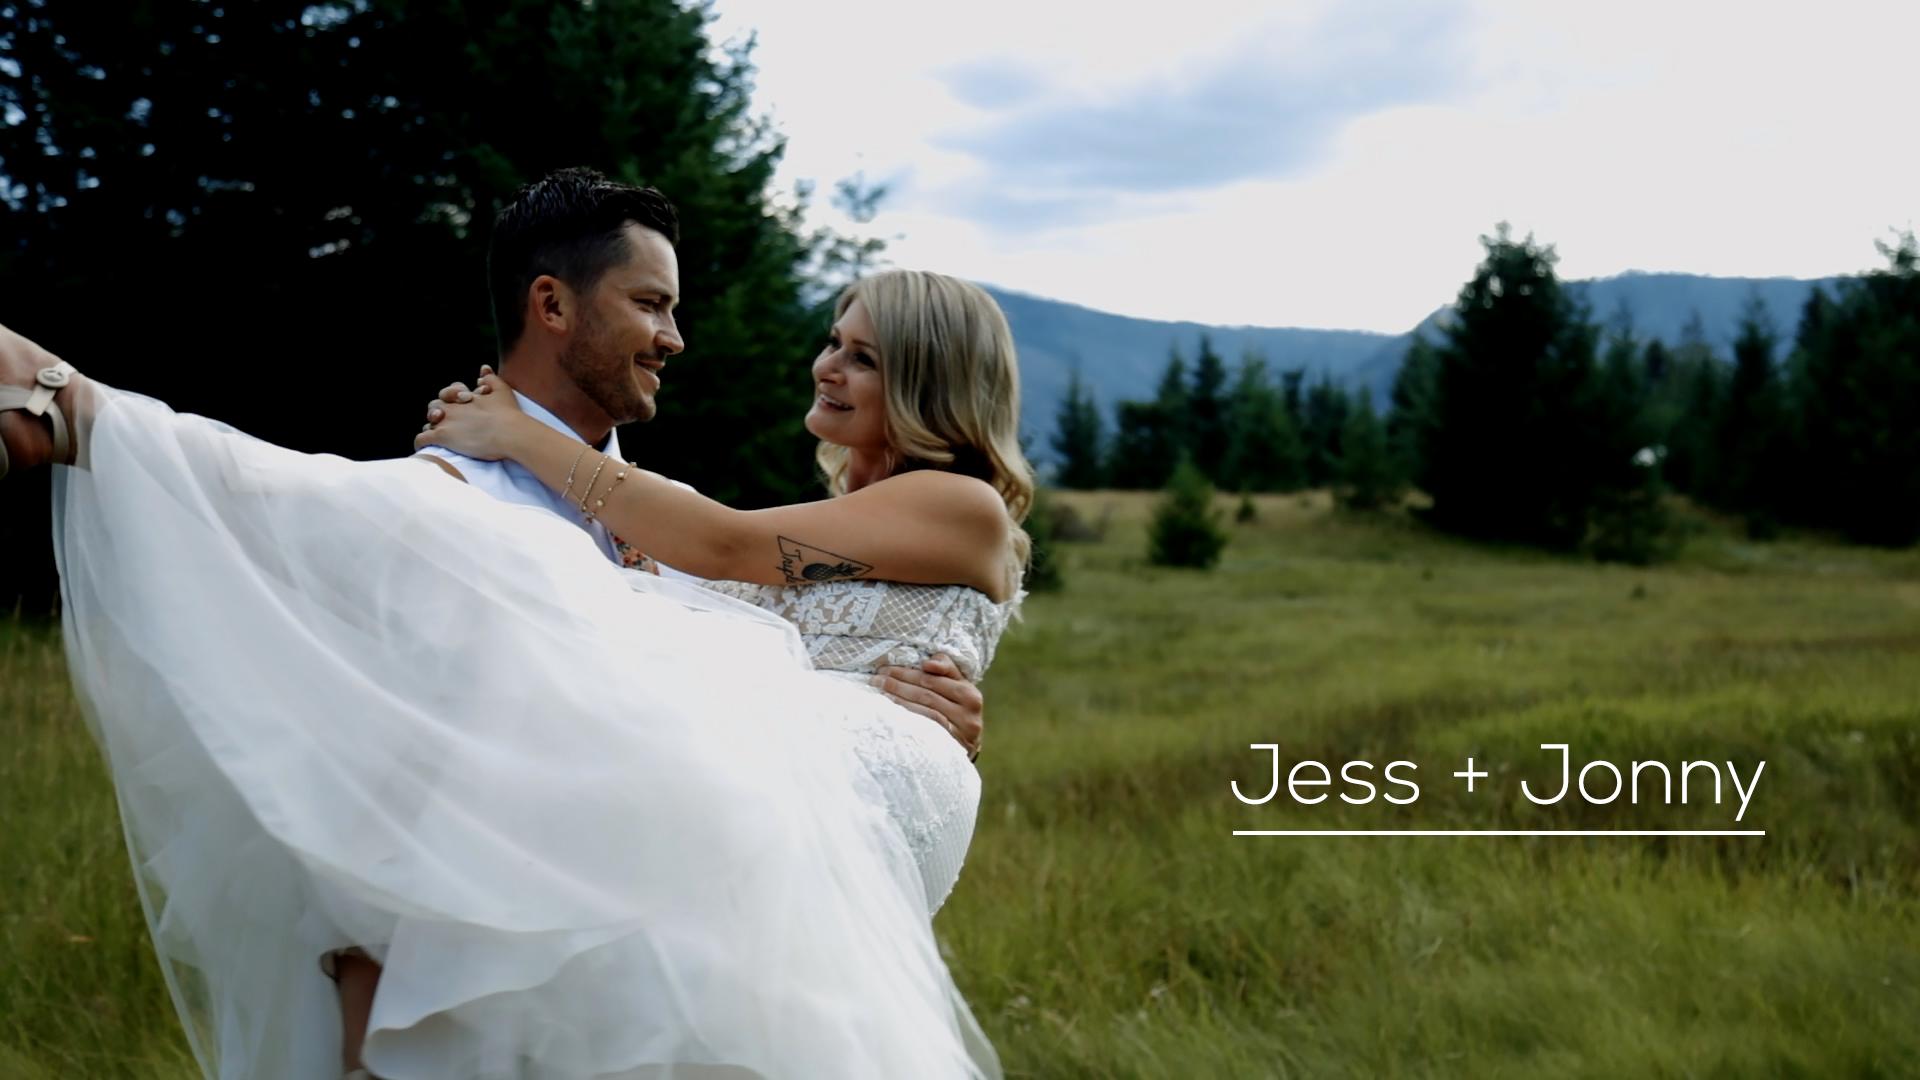 Jess + Jonny | Sorrento, Canada | Rustic Wedding